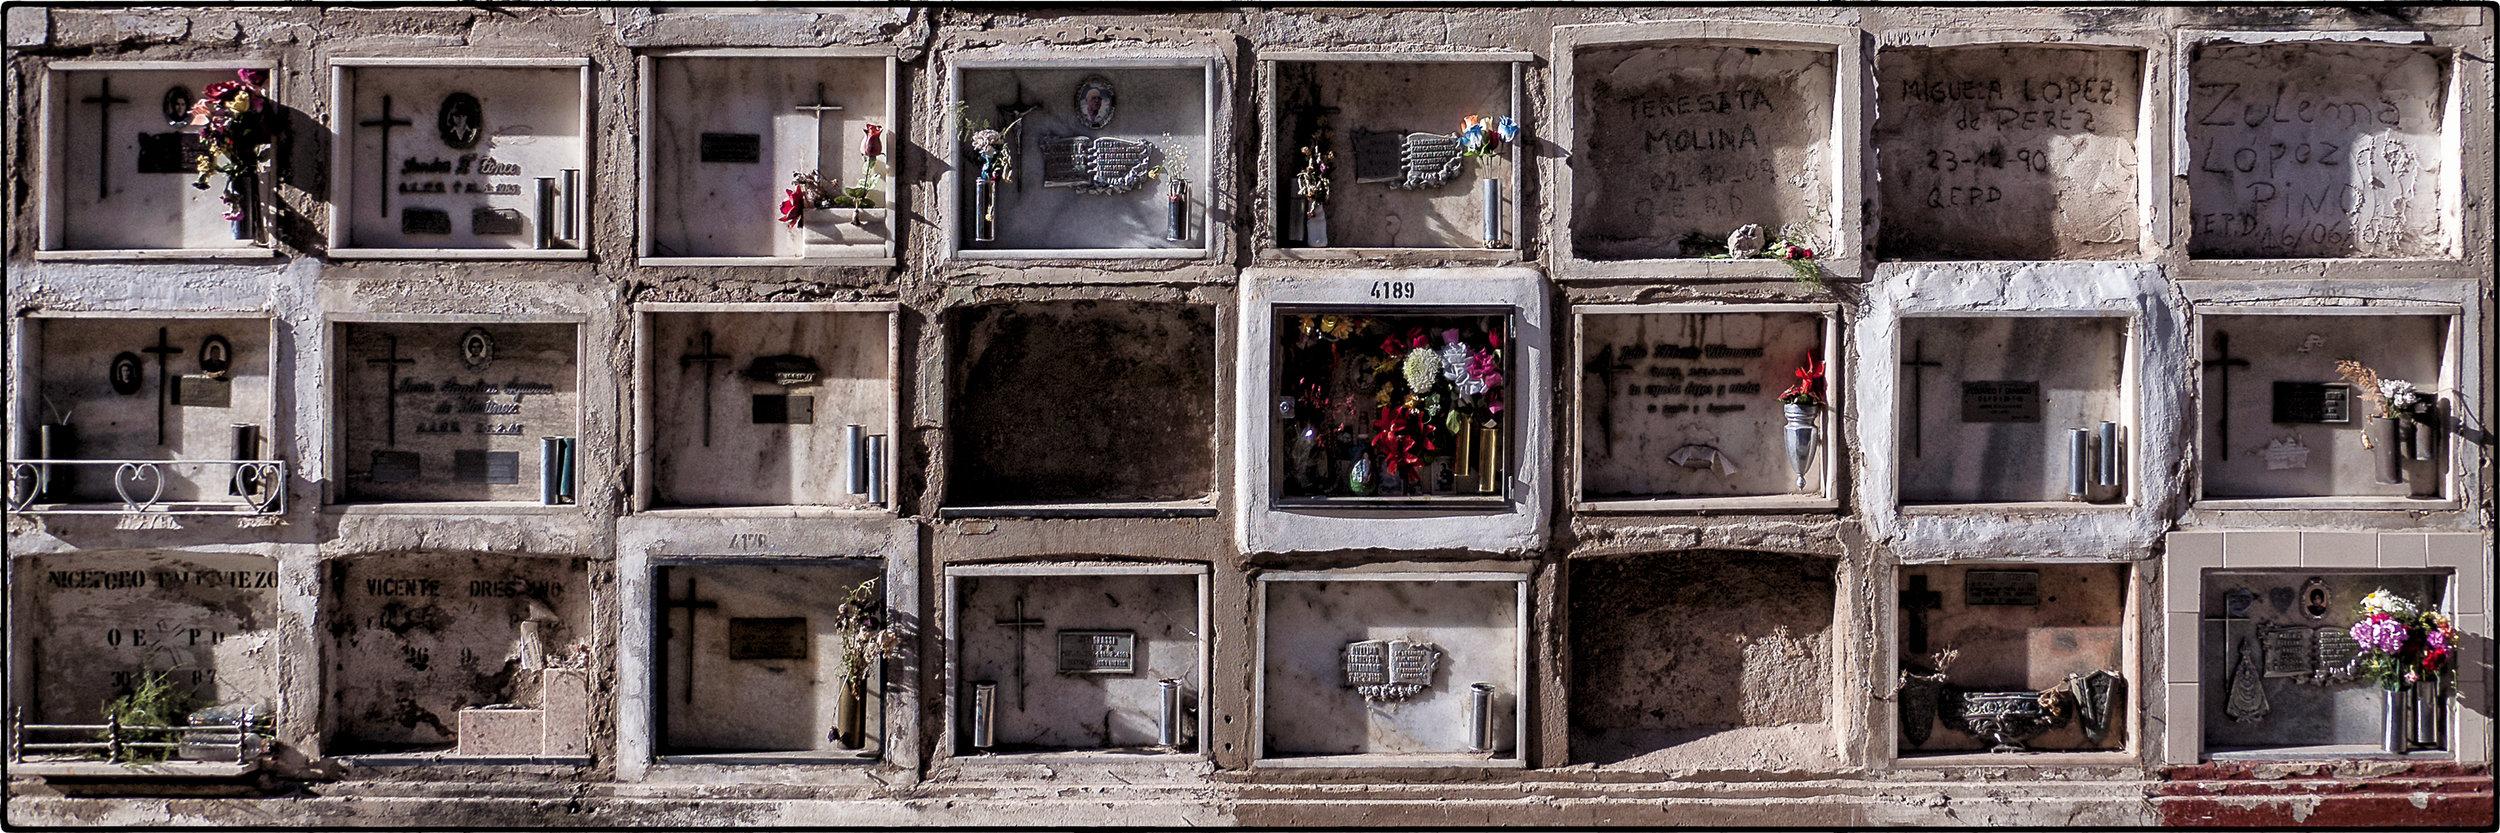 Cemeteries -